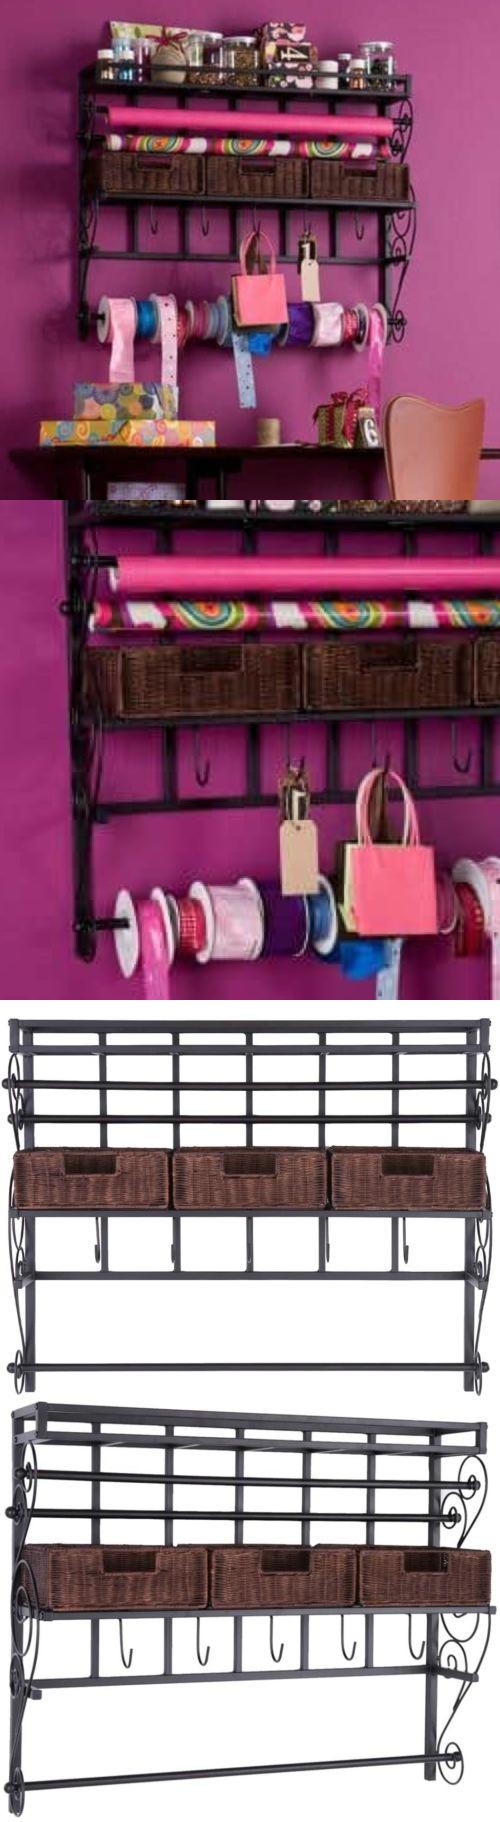 Craft And Paper Racks 146402: Upton Home Burnet Espresso Hanging Craft  Paper Dispenser Wall Mount